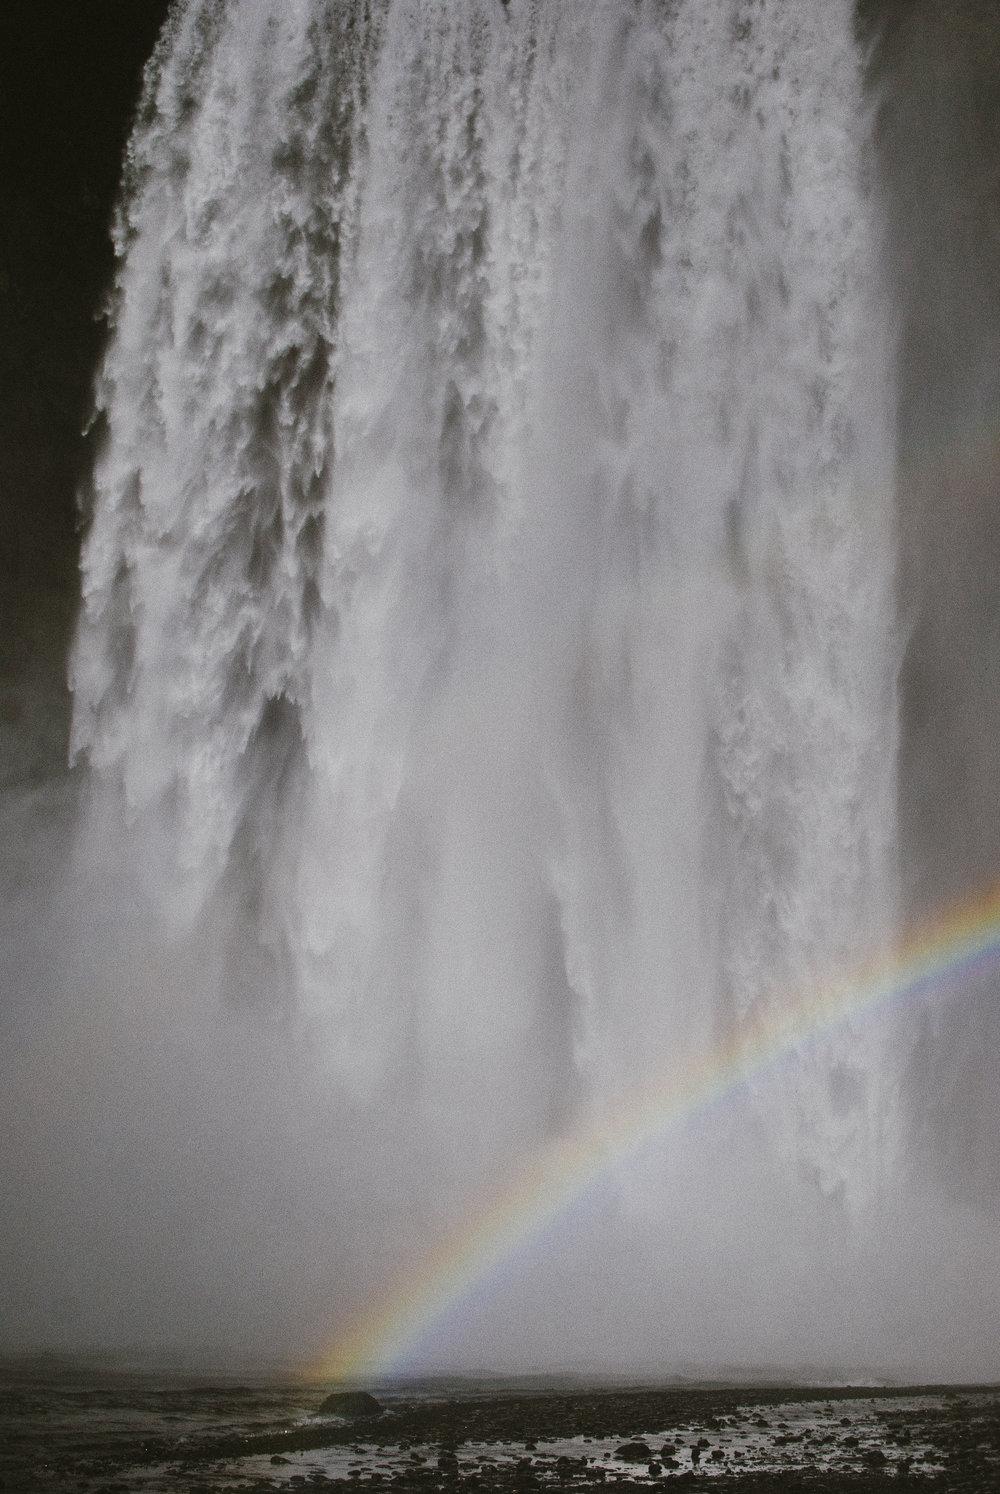 Iceland_Skogarfoss_Falls_Rainbow.jpg